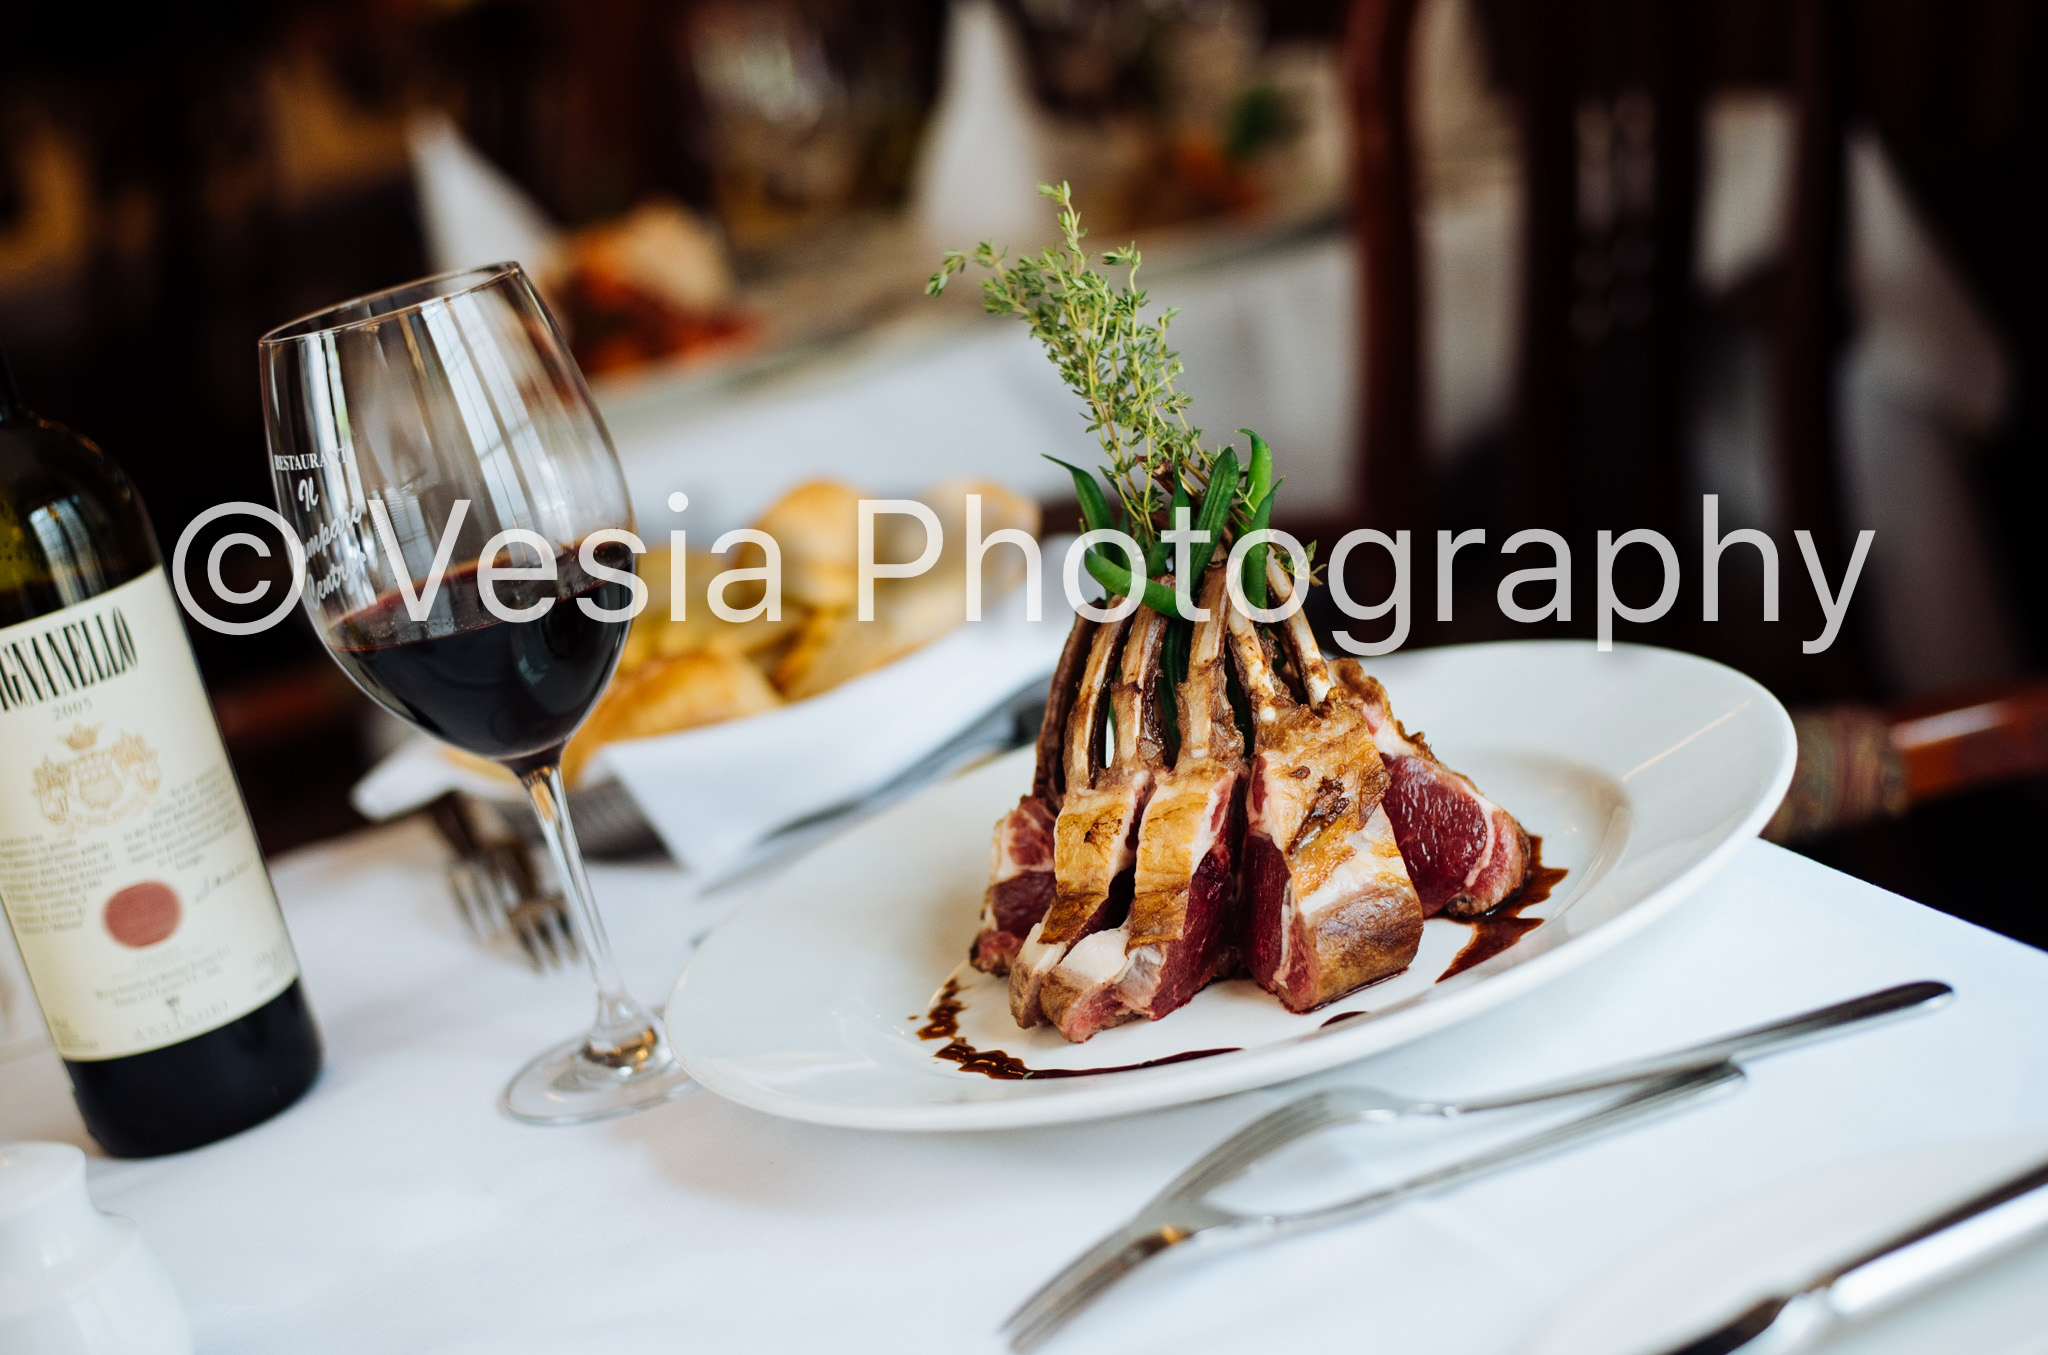 Campari_Centro_Food_Proofs-24.jpg